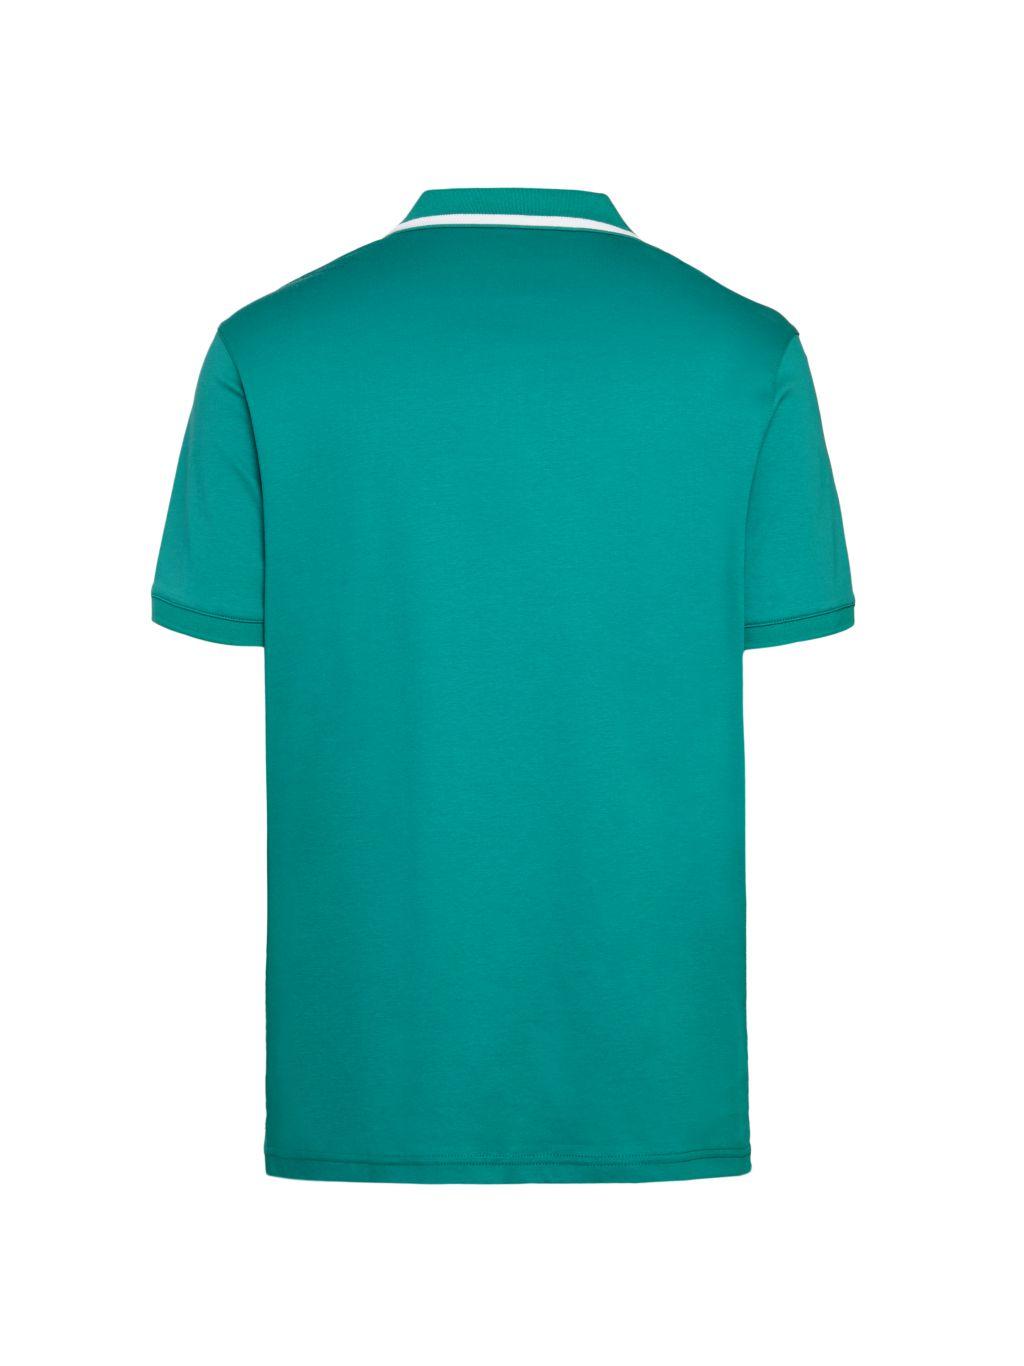 Michael Kors Striped-Collar Polo